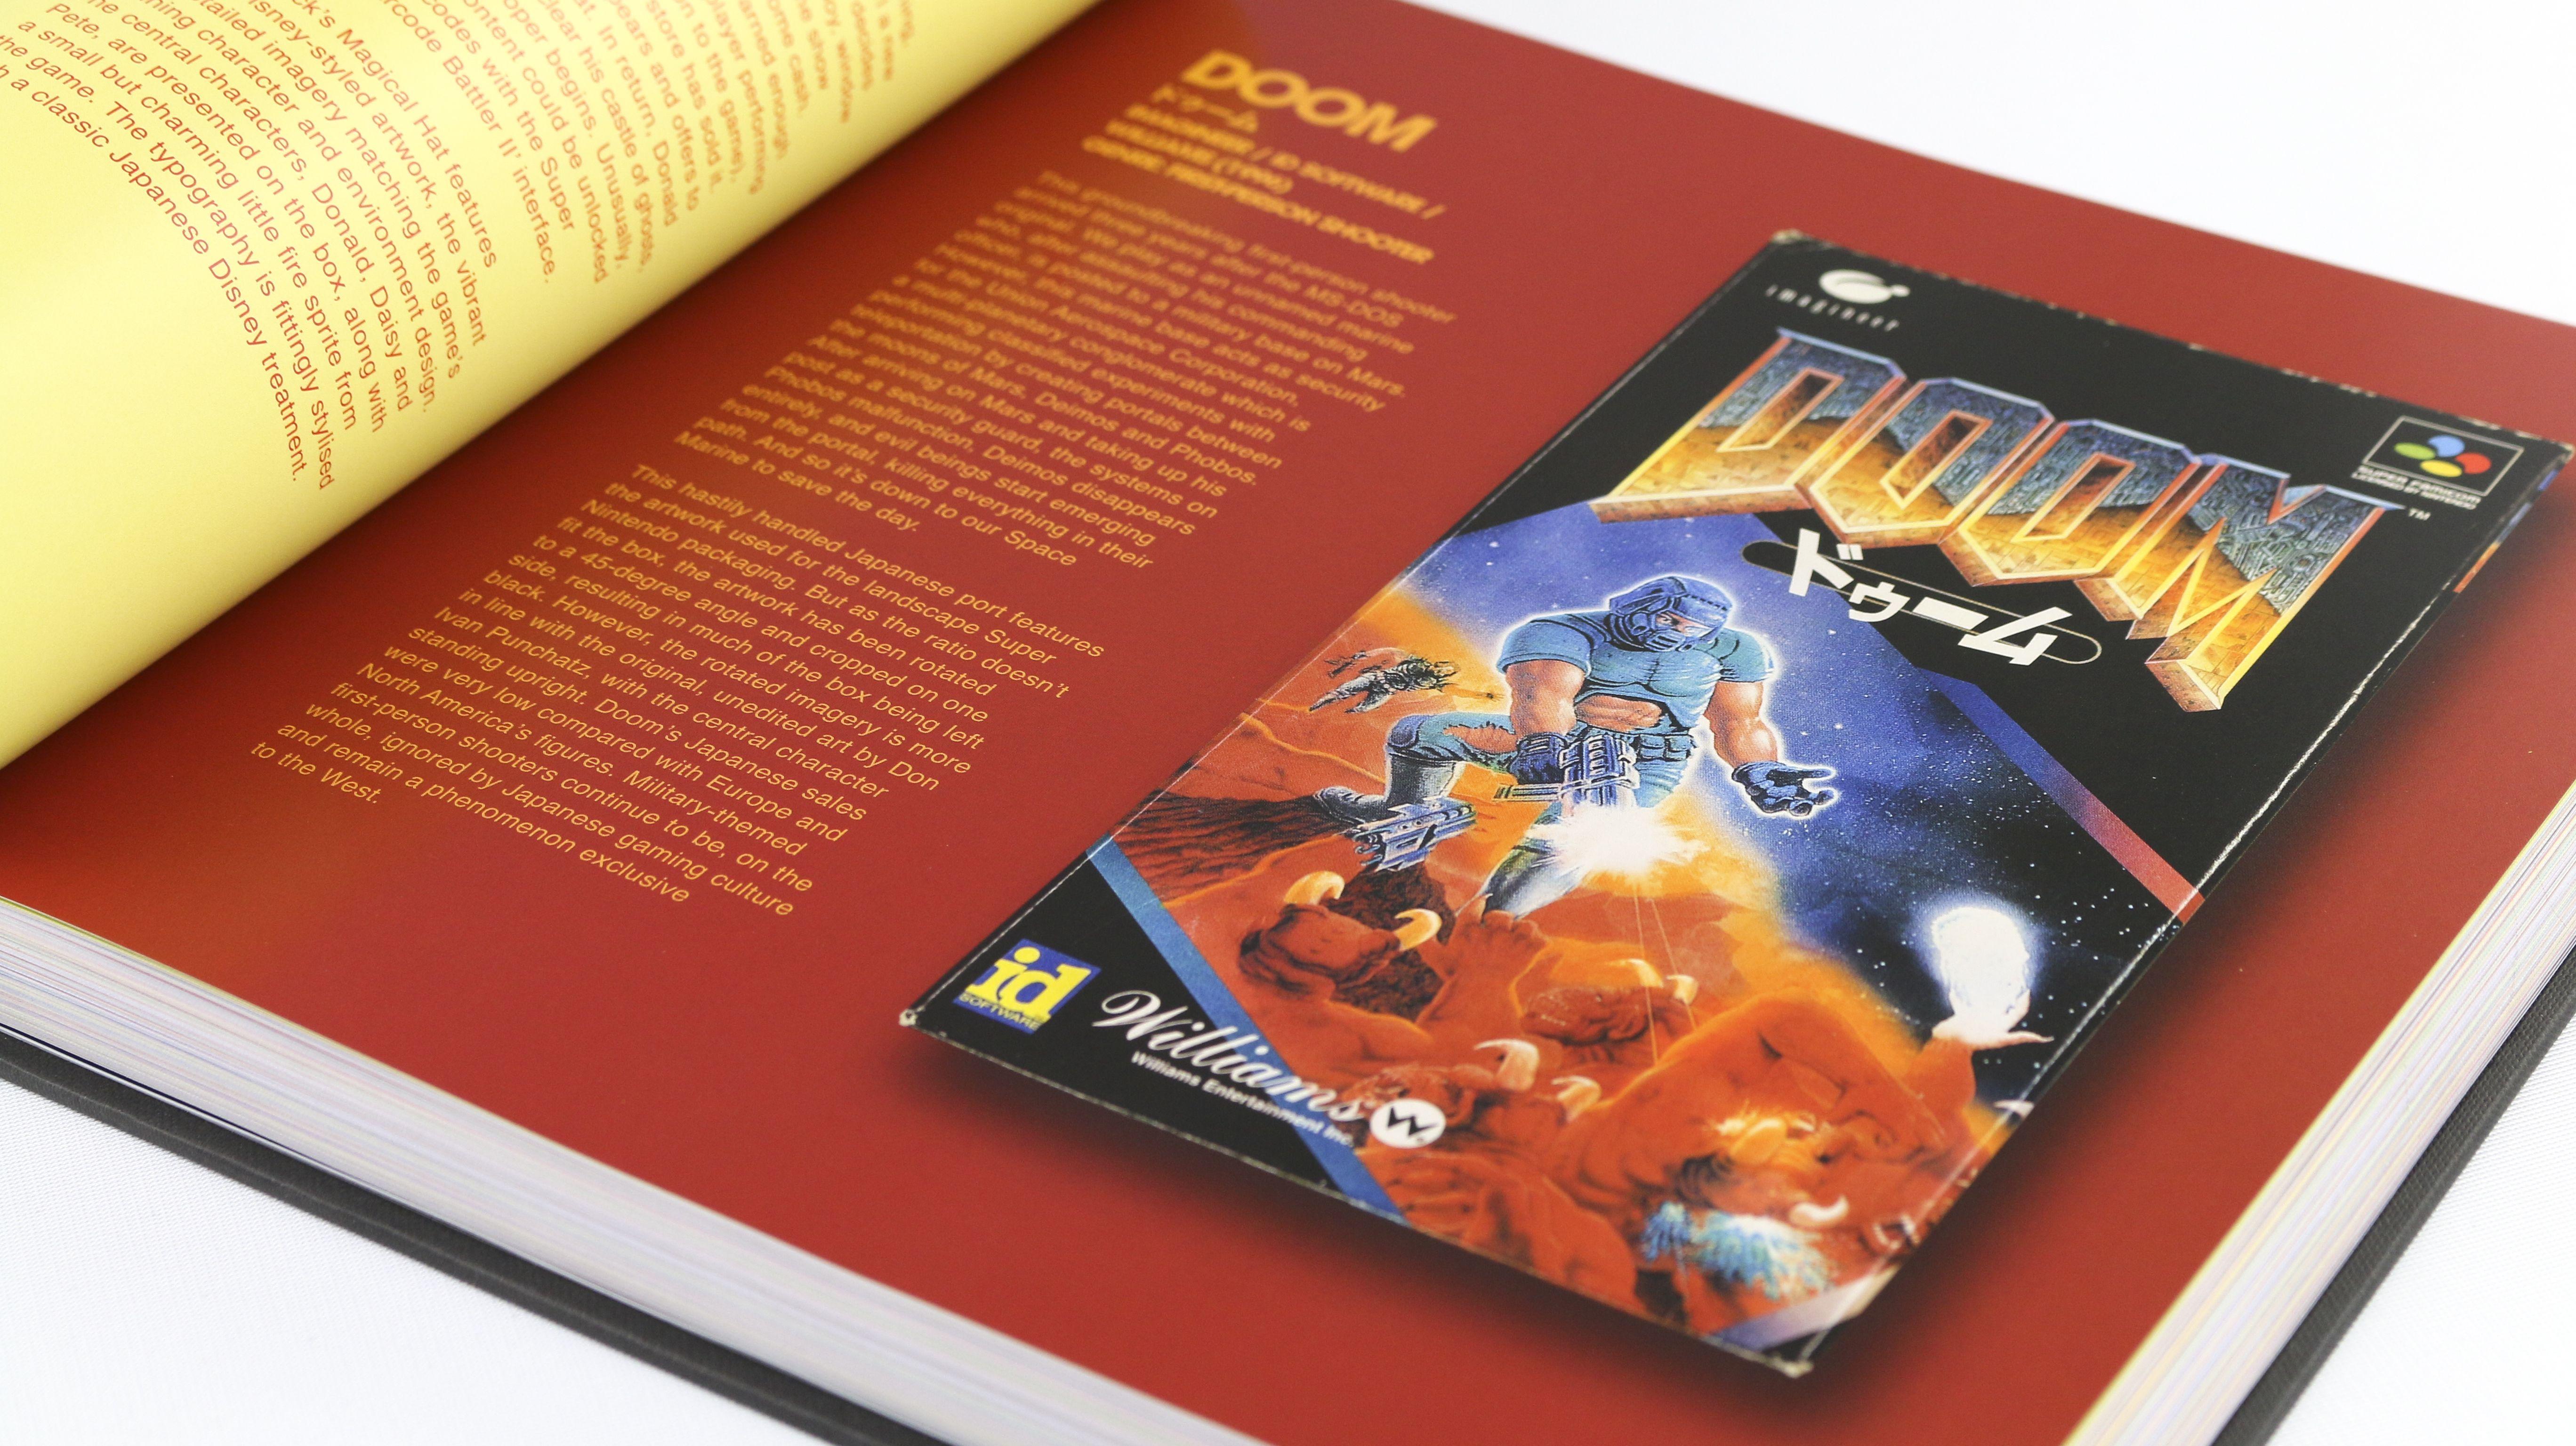 Pin by FuntockRetro co uk on Super Famicom Box Art Collection | Box